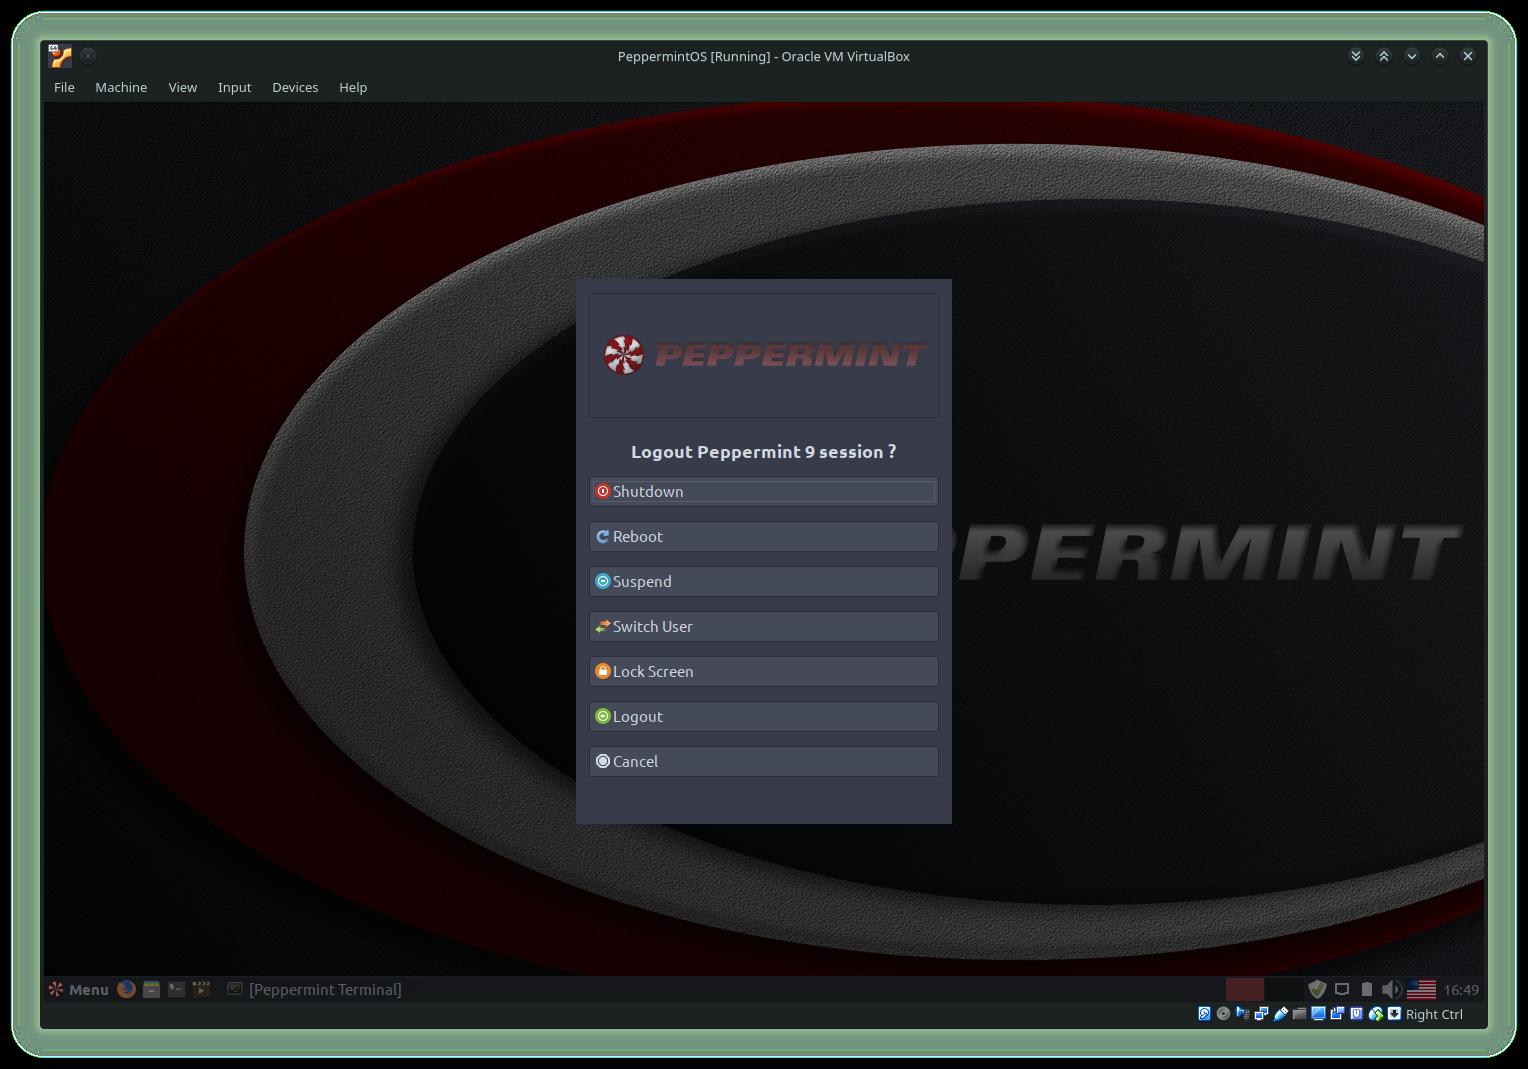 peppermintos-14-shutdown.png